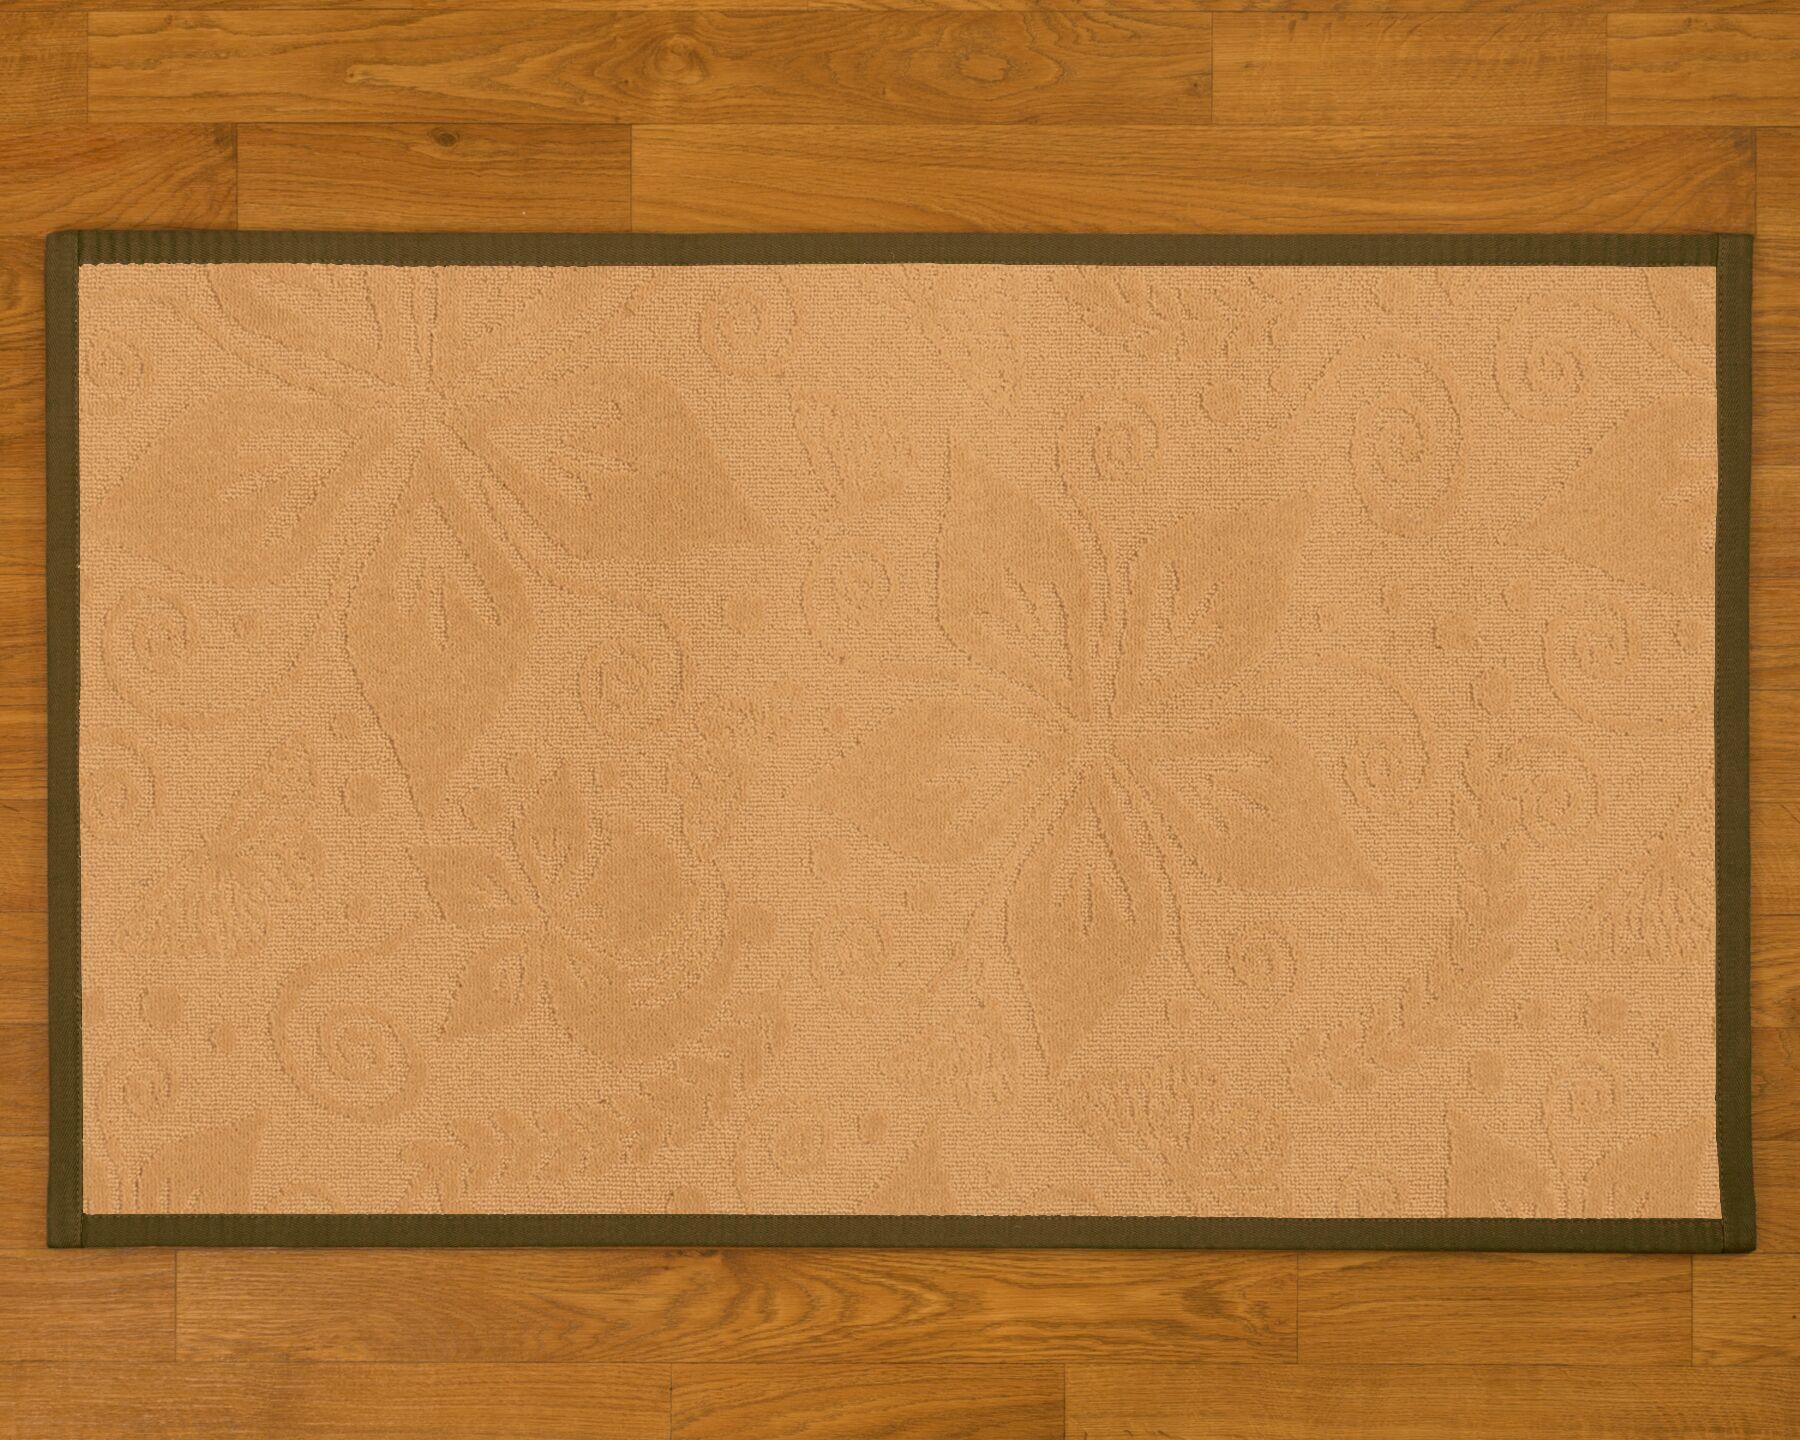 Handmade Beige Area Rug Rug Size: Rectangle 6' x 9'